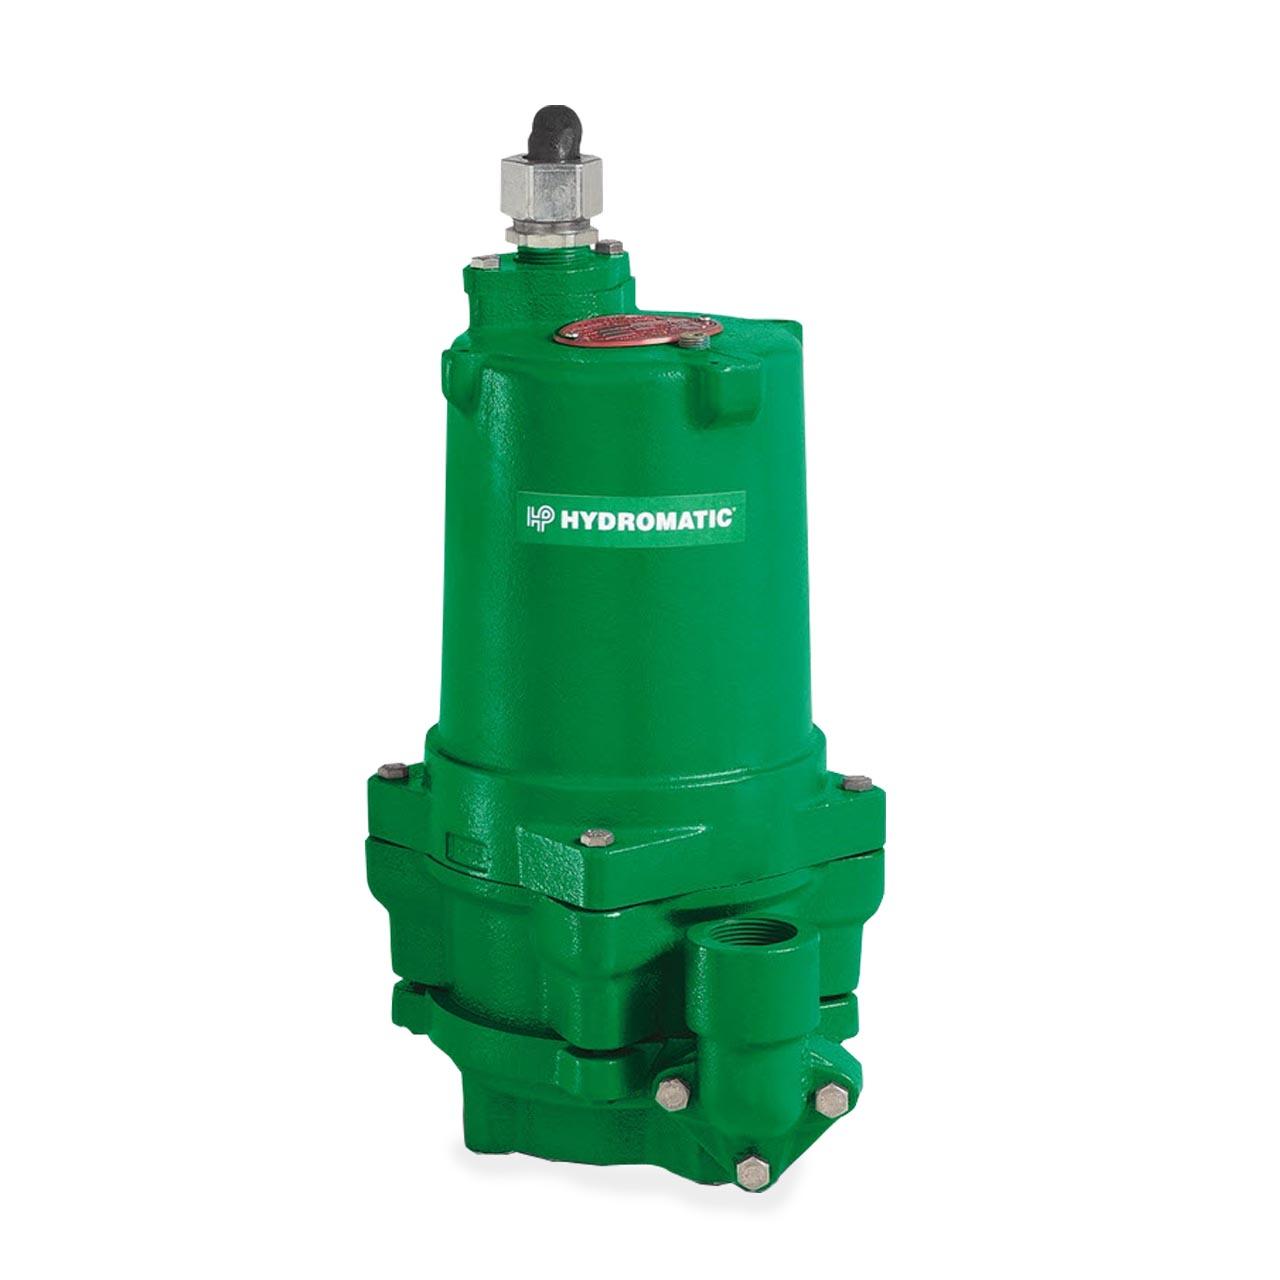 hydromatic pump hydromatic hpg200m2 2 submersible sewage grinder hydromatic pump hydromatic hpg200m2 2 submersible sewage grinder pump 2 0 hp 230v 1ph manual 3 75a imp 20 cord htc526031107